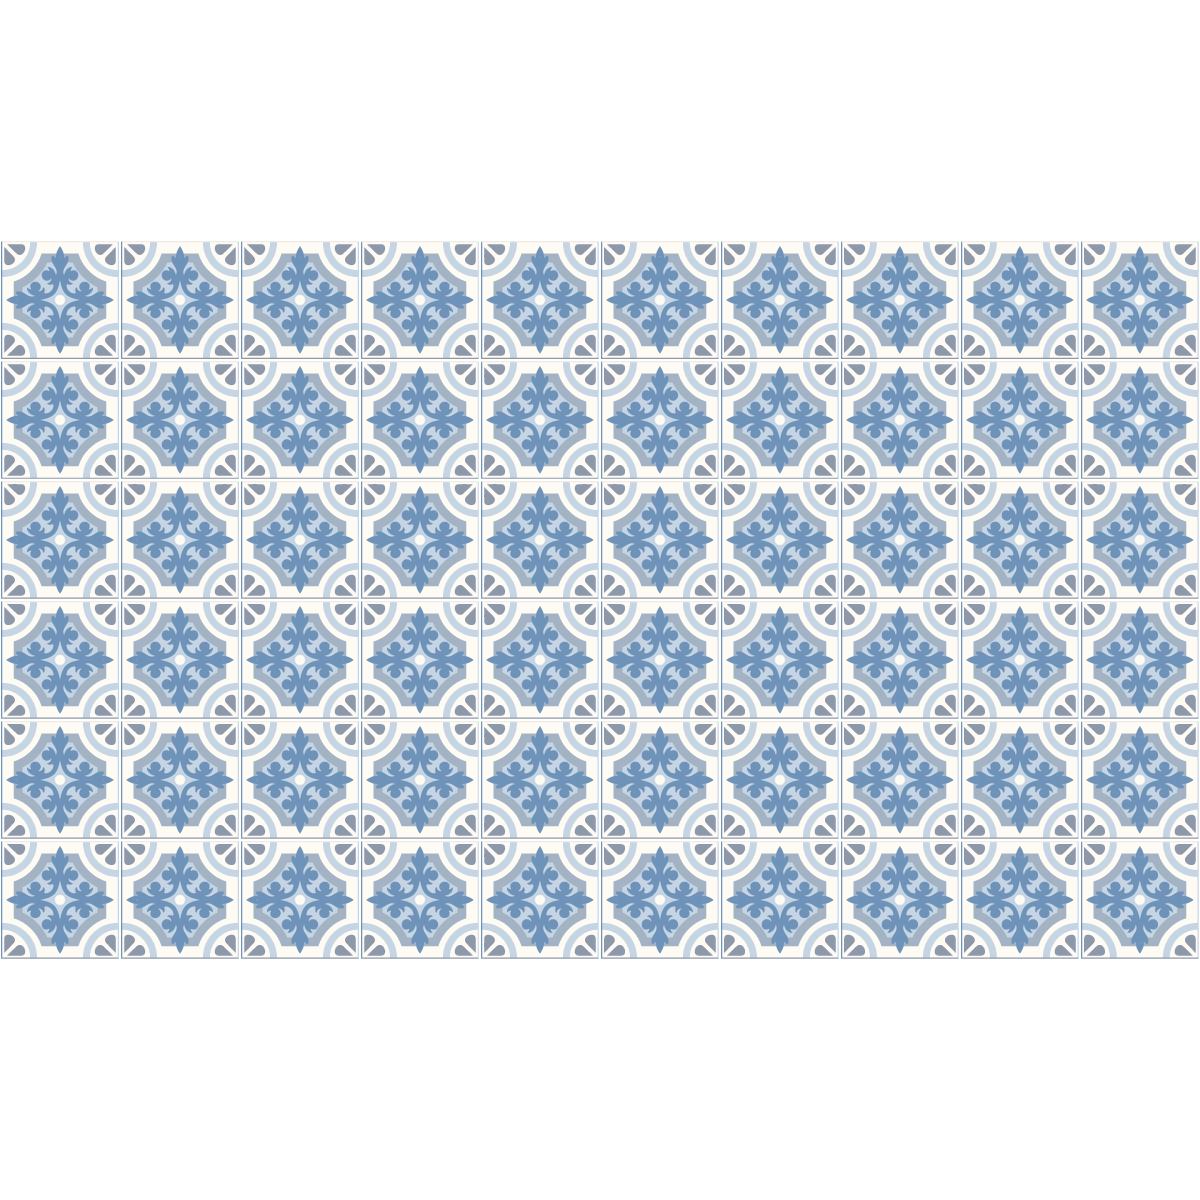 60 stickers carreaux de ciment azulejos mina salle de bain mur salle de bain ambiance sticker. Black Bedroom Furniture Sets. Home Design Ideas